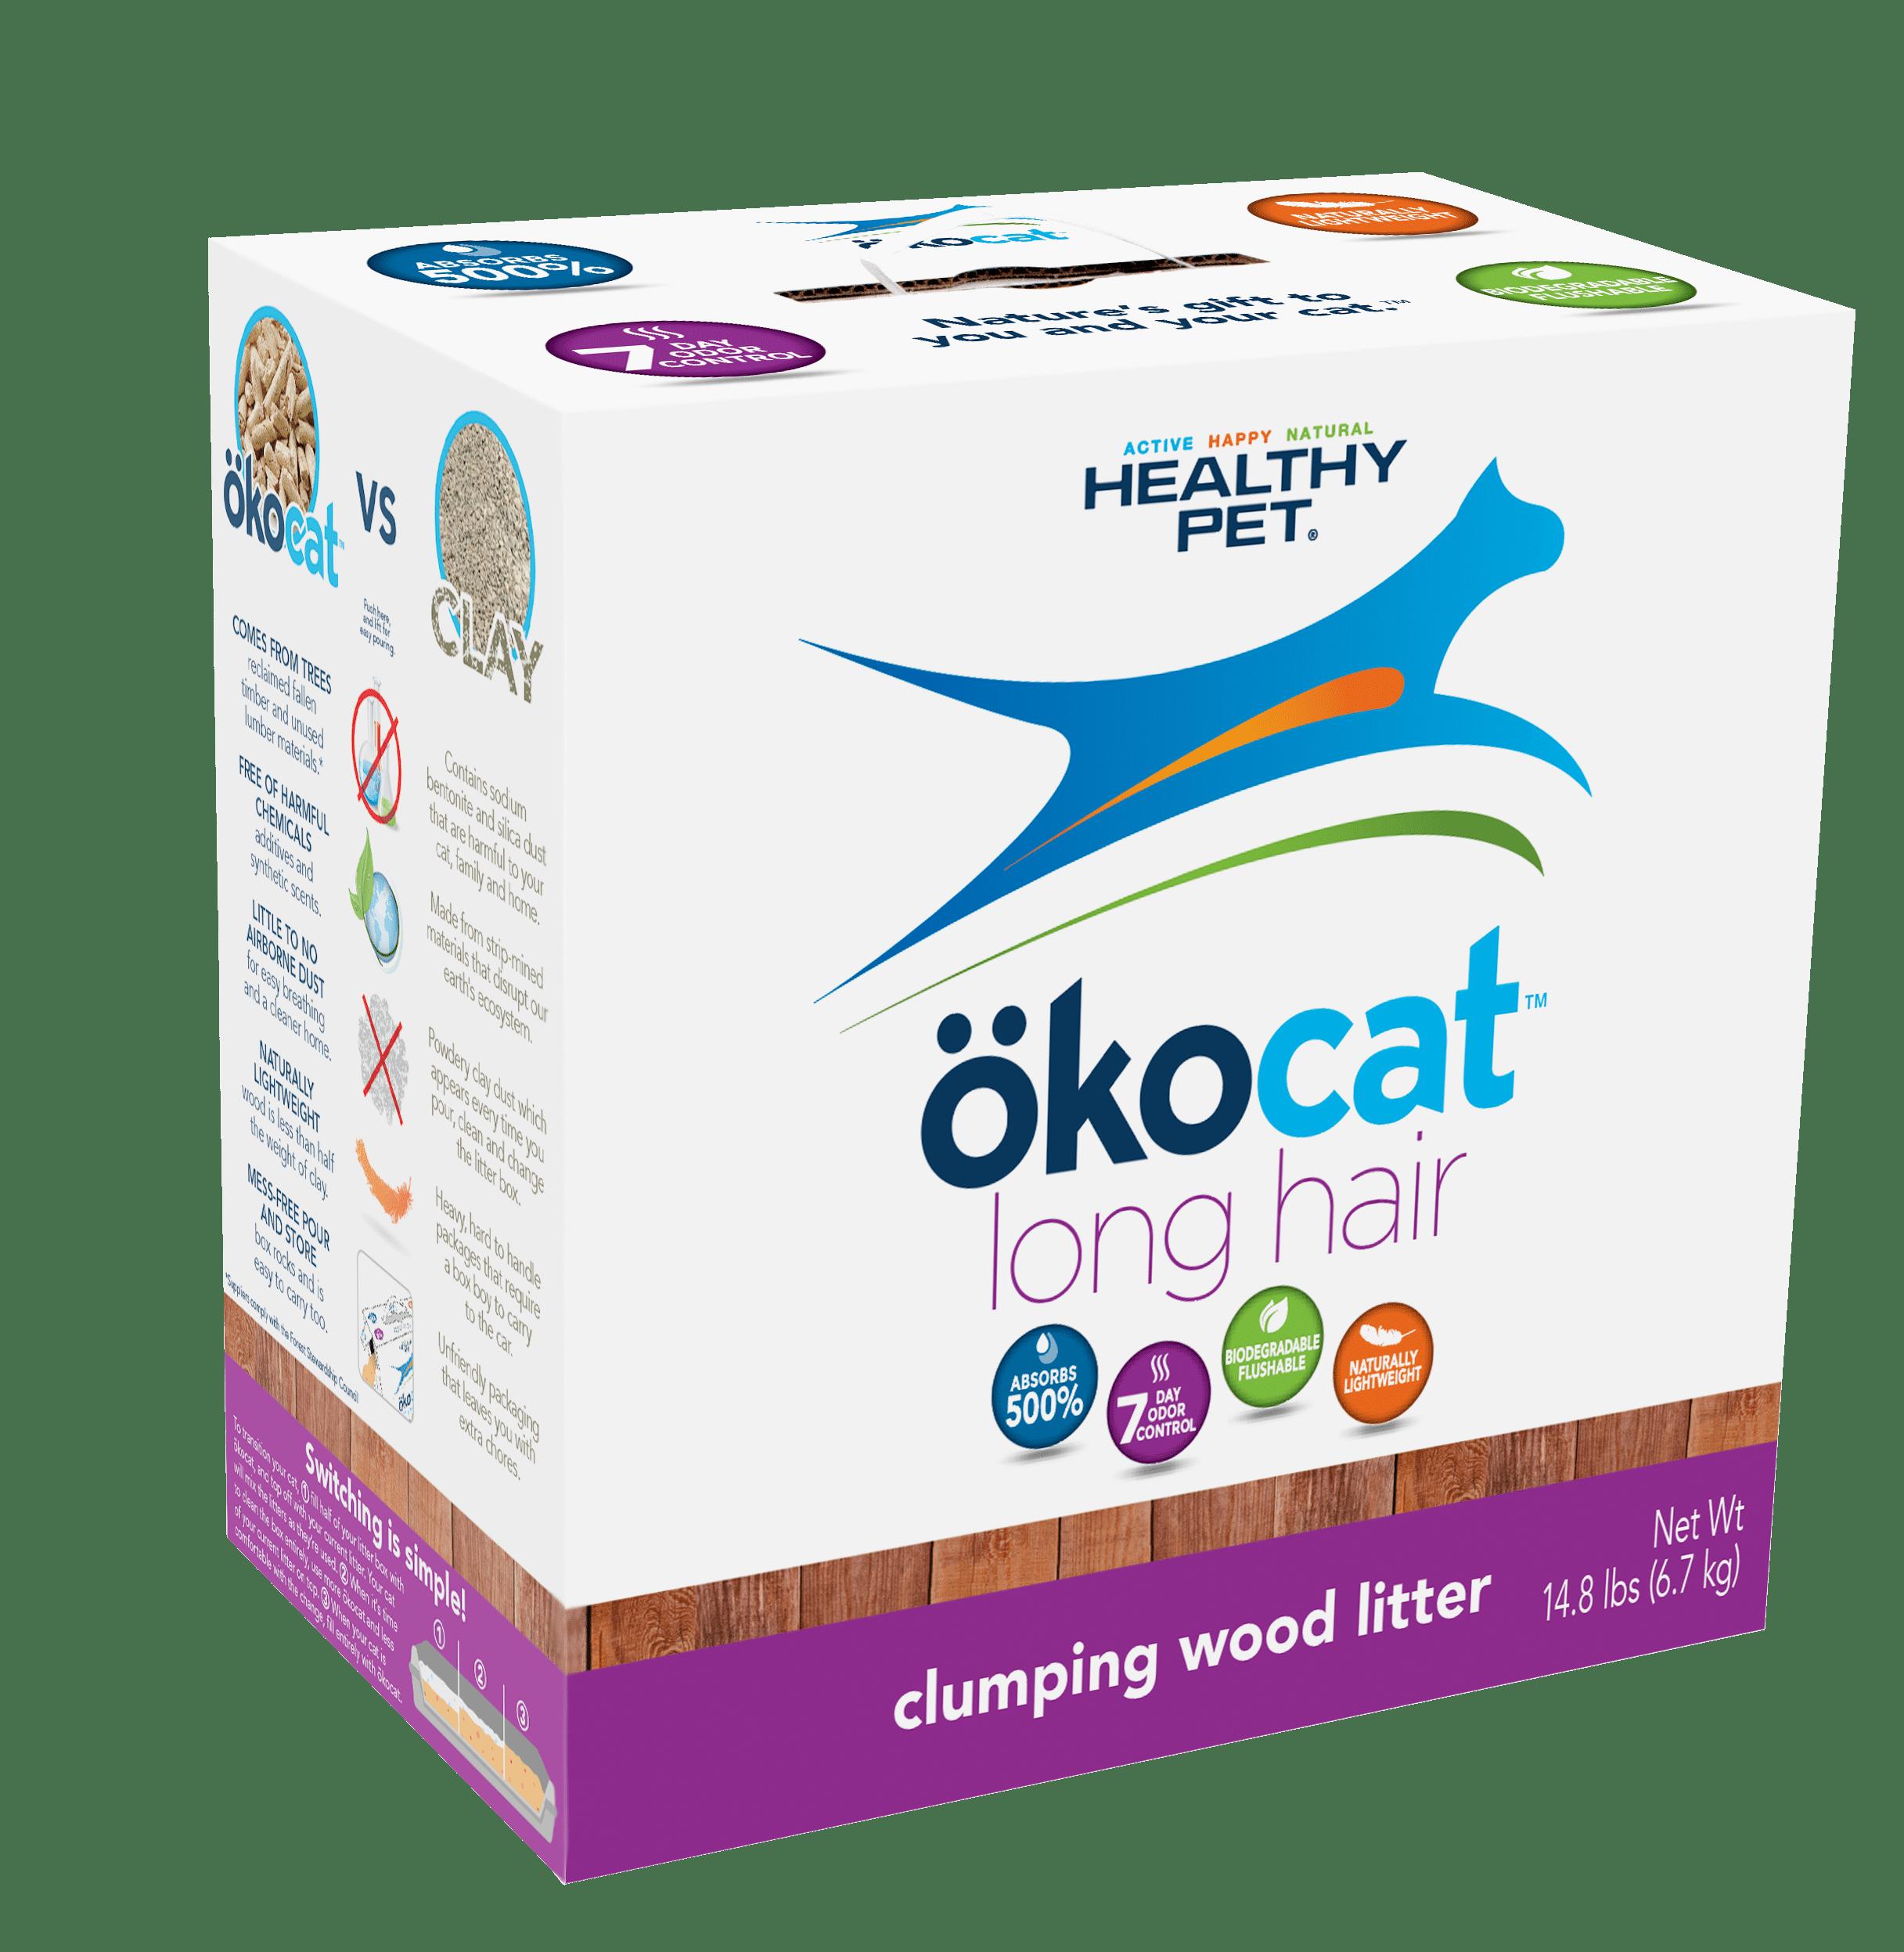 Okocat Long Hair Breeds Clumping Wood Cat Litter, 14.8-lb